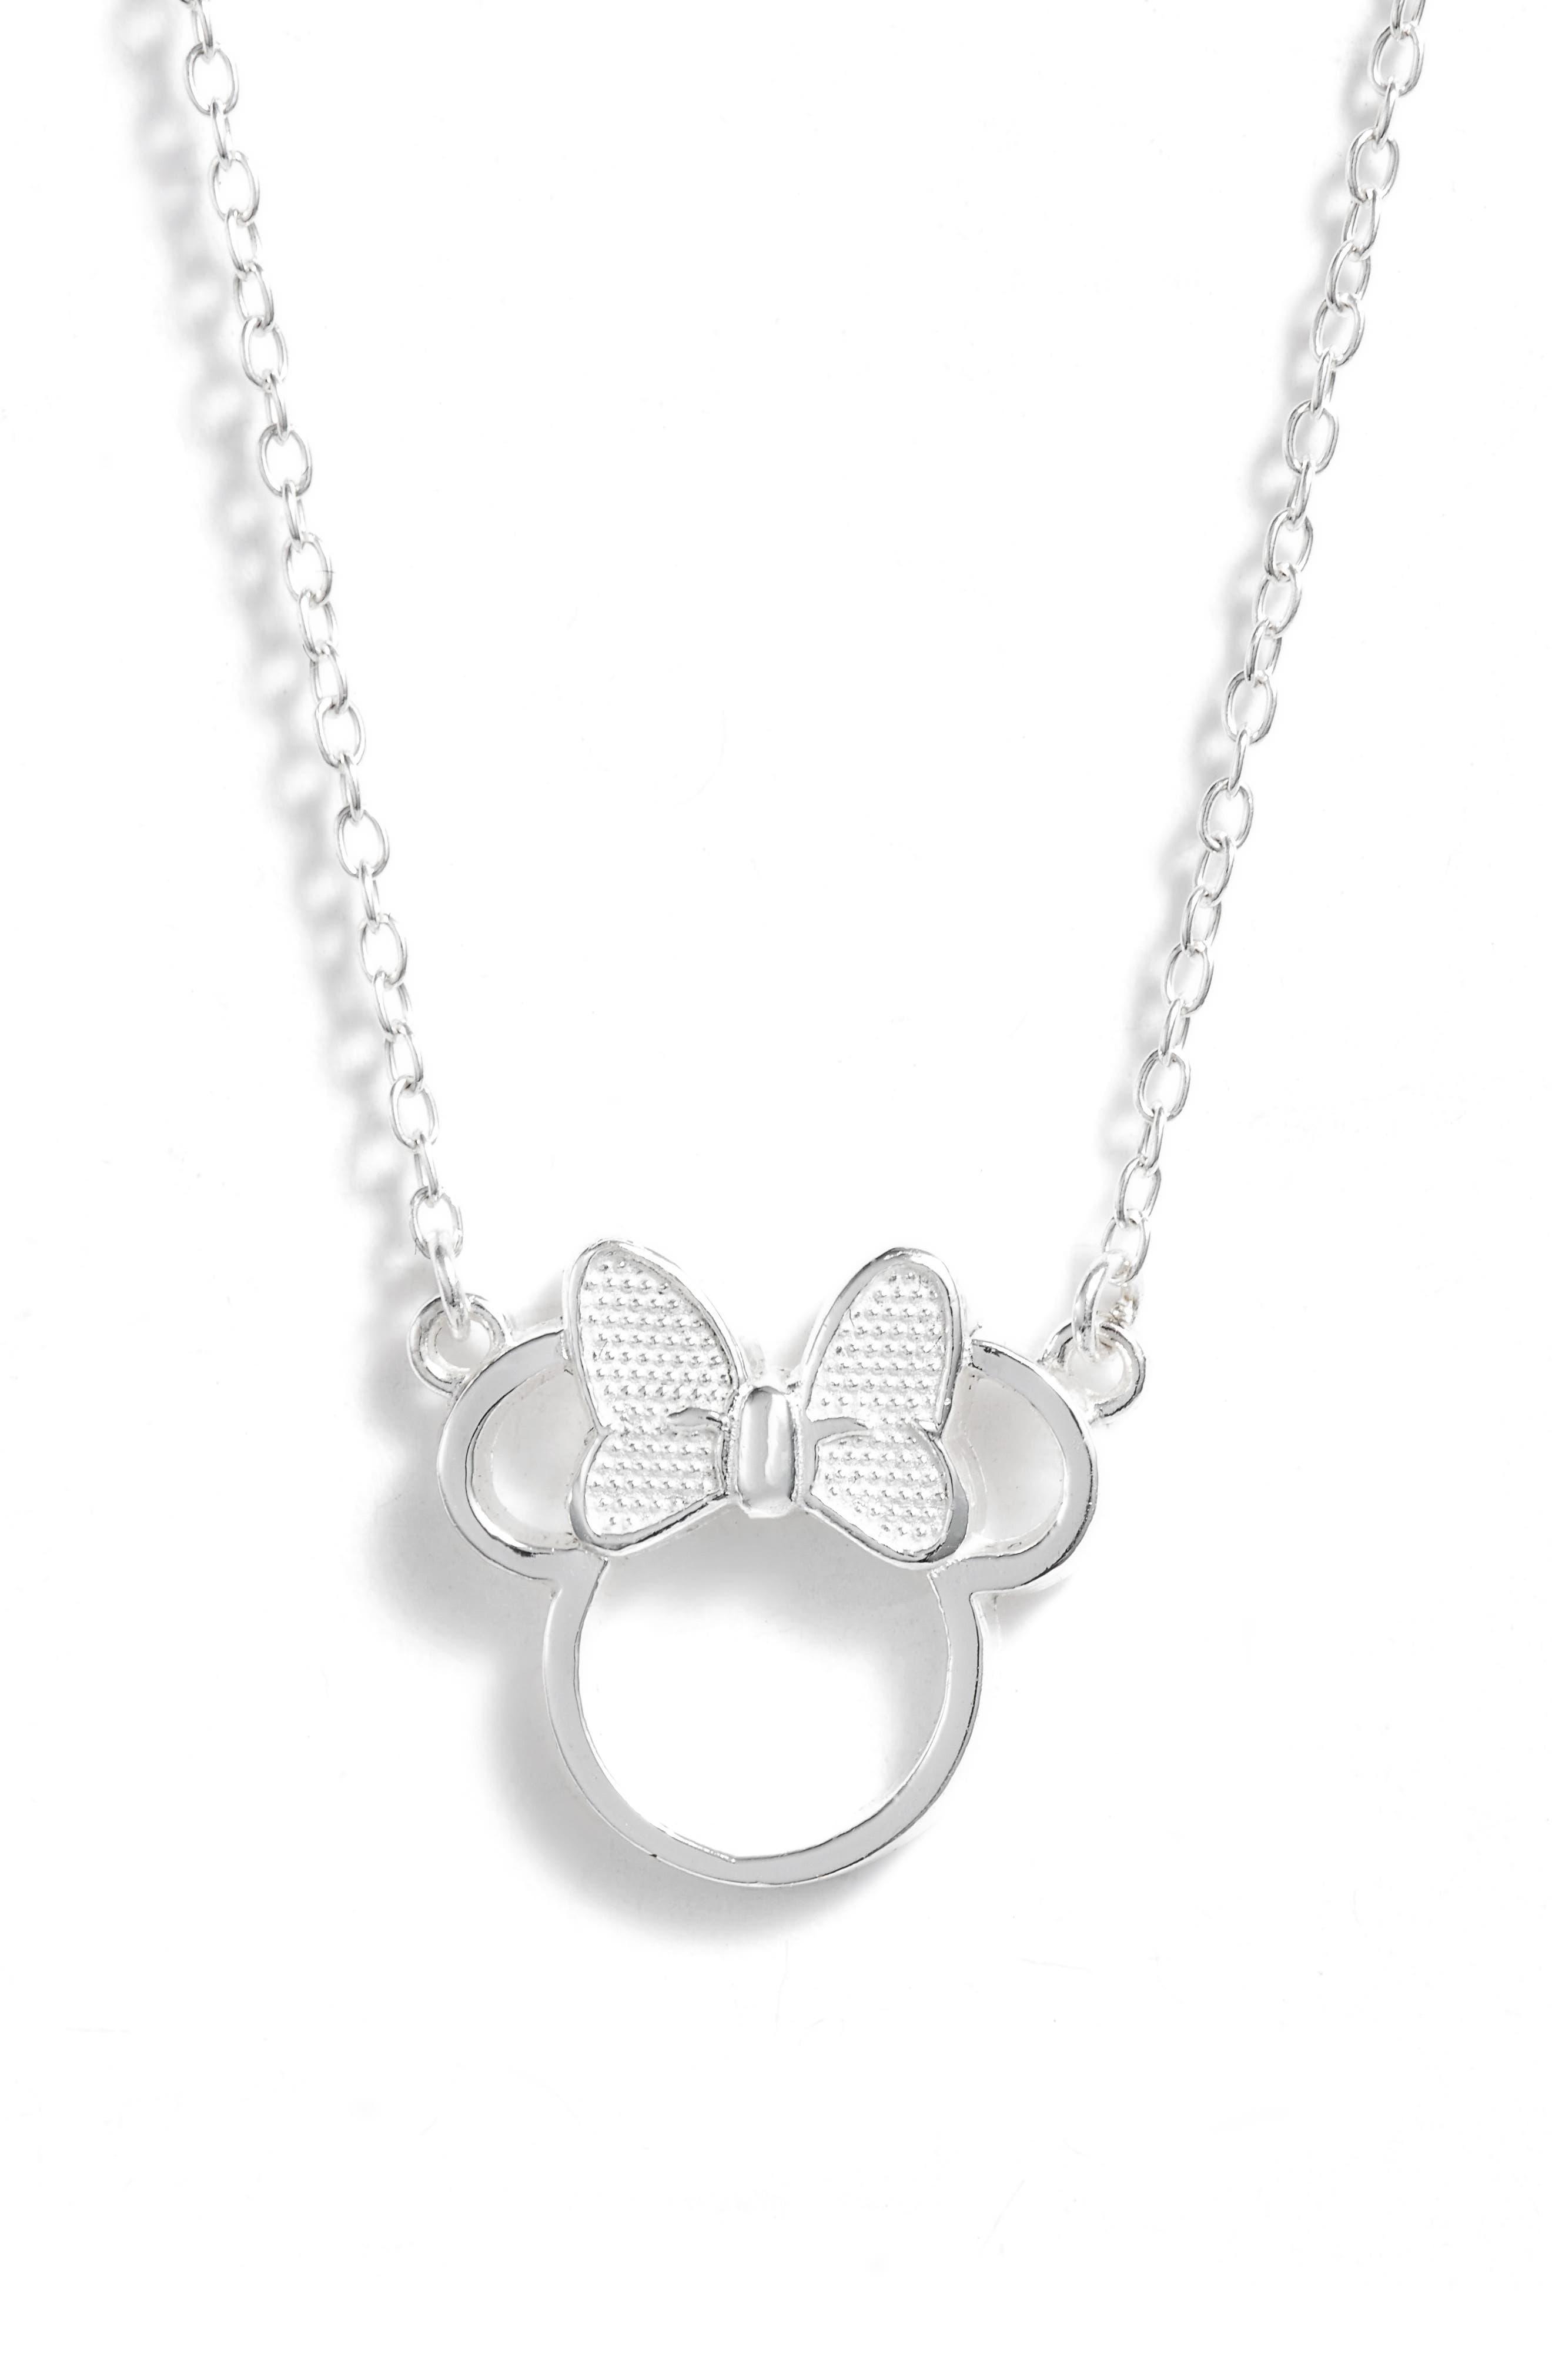 Minnie Mouse Pendant Necklace,                             Main thumbnail 1, color,                             SILVER